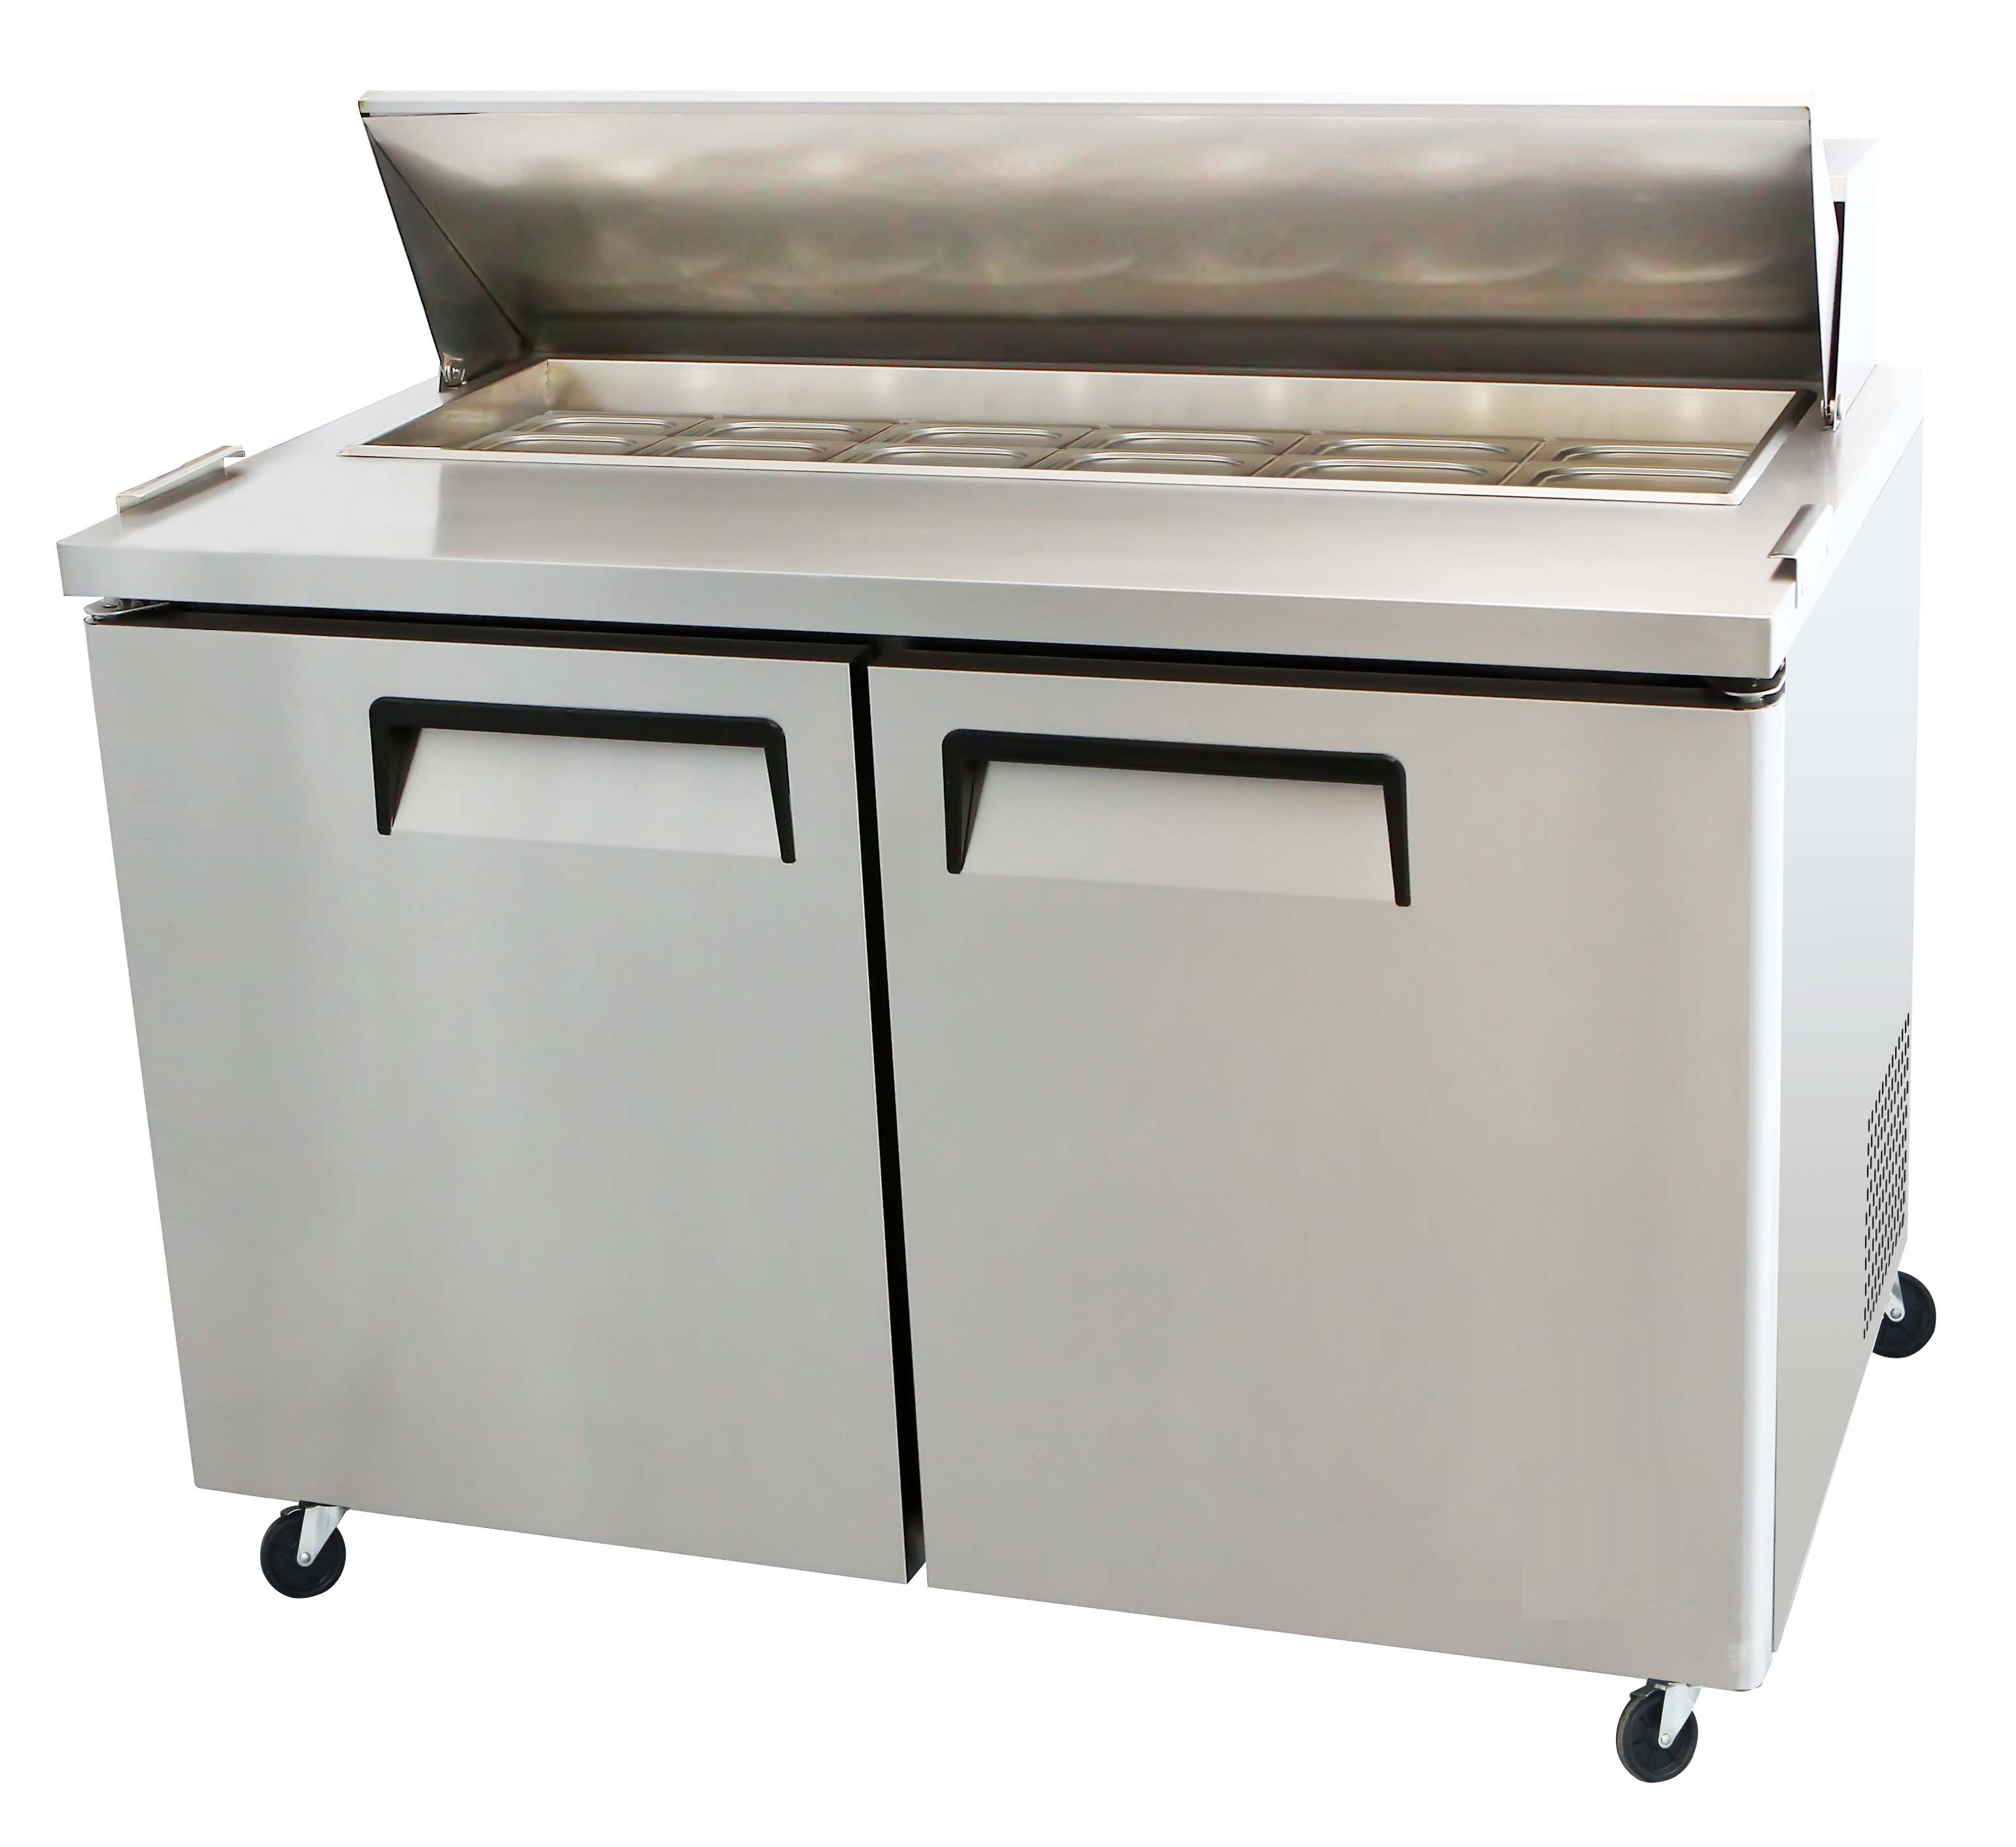 Toronto Refrigeration And Freezer Retailer Of Hussmann True - Sandwich prep table cooler